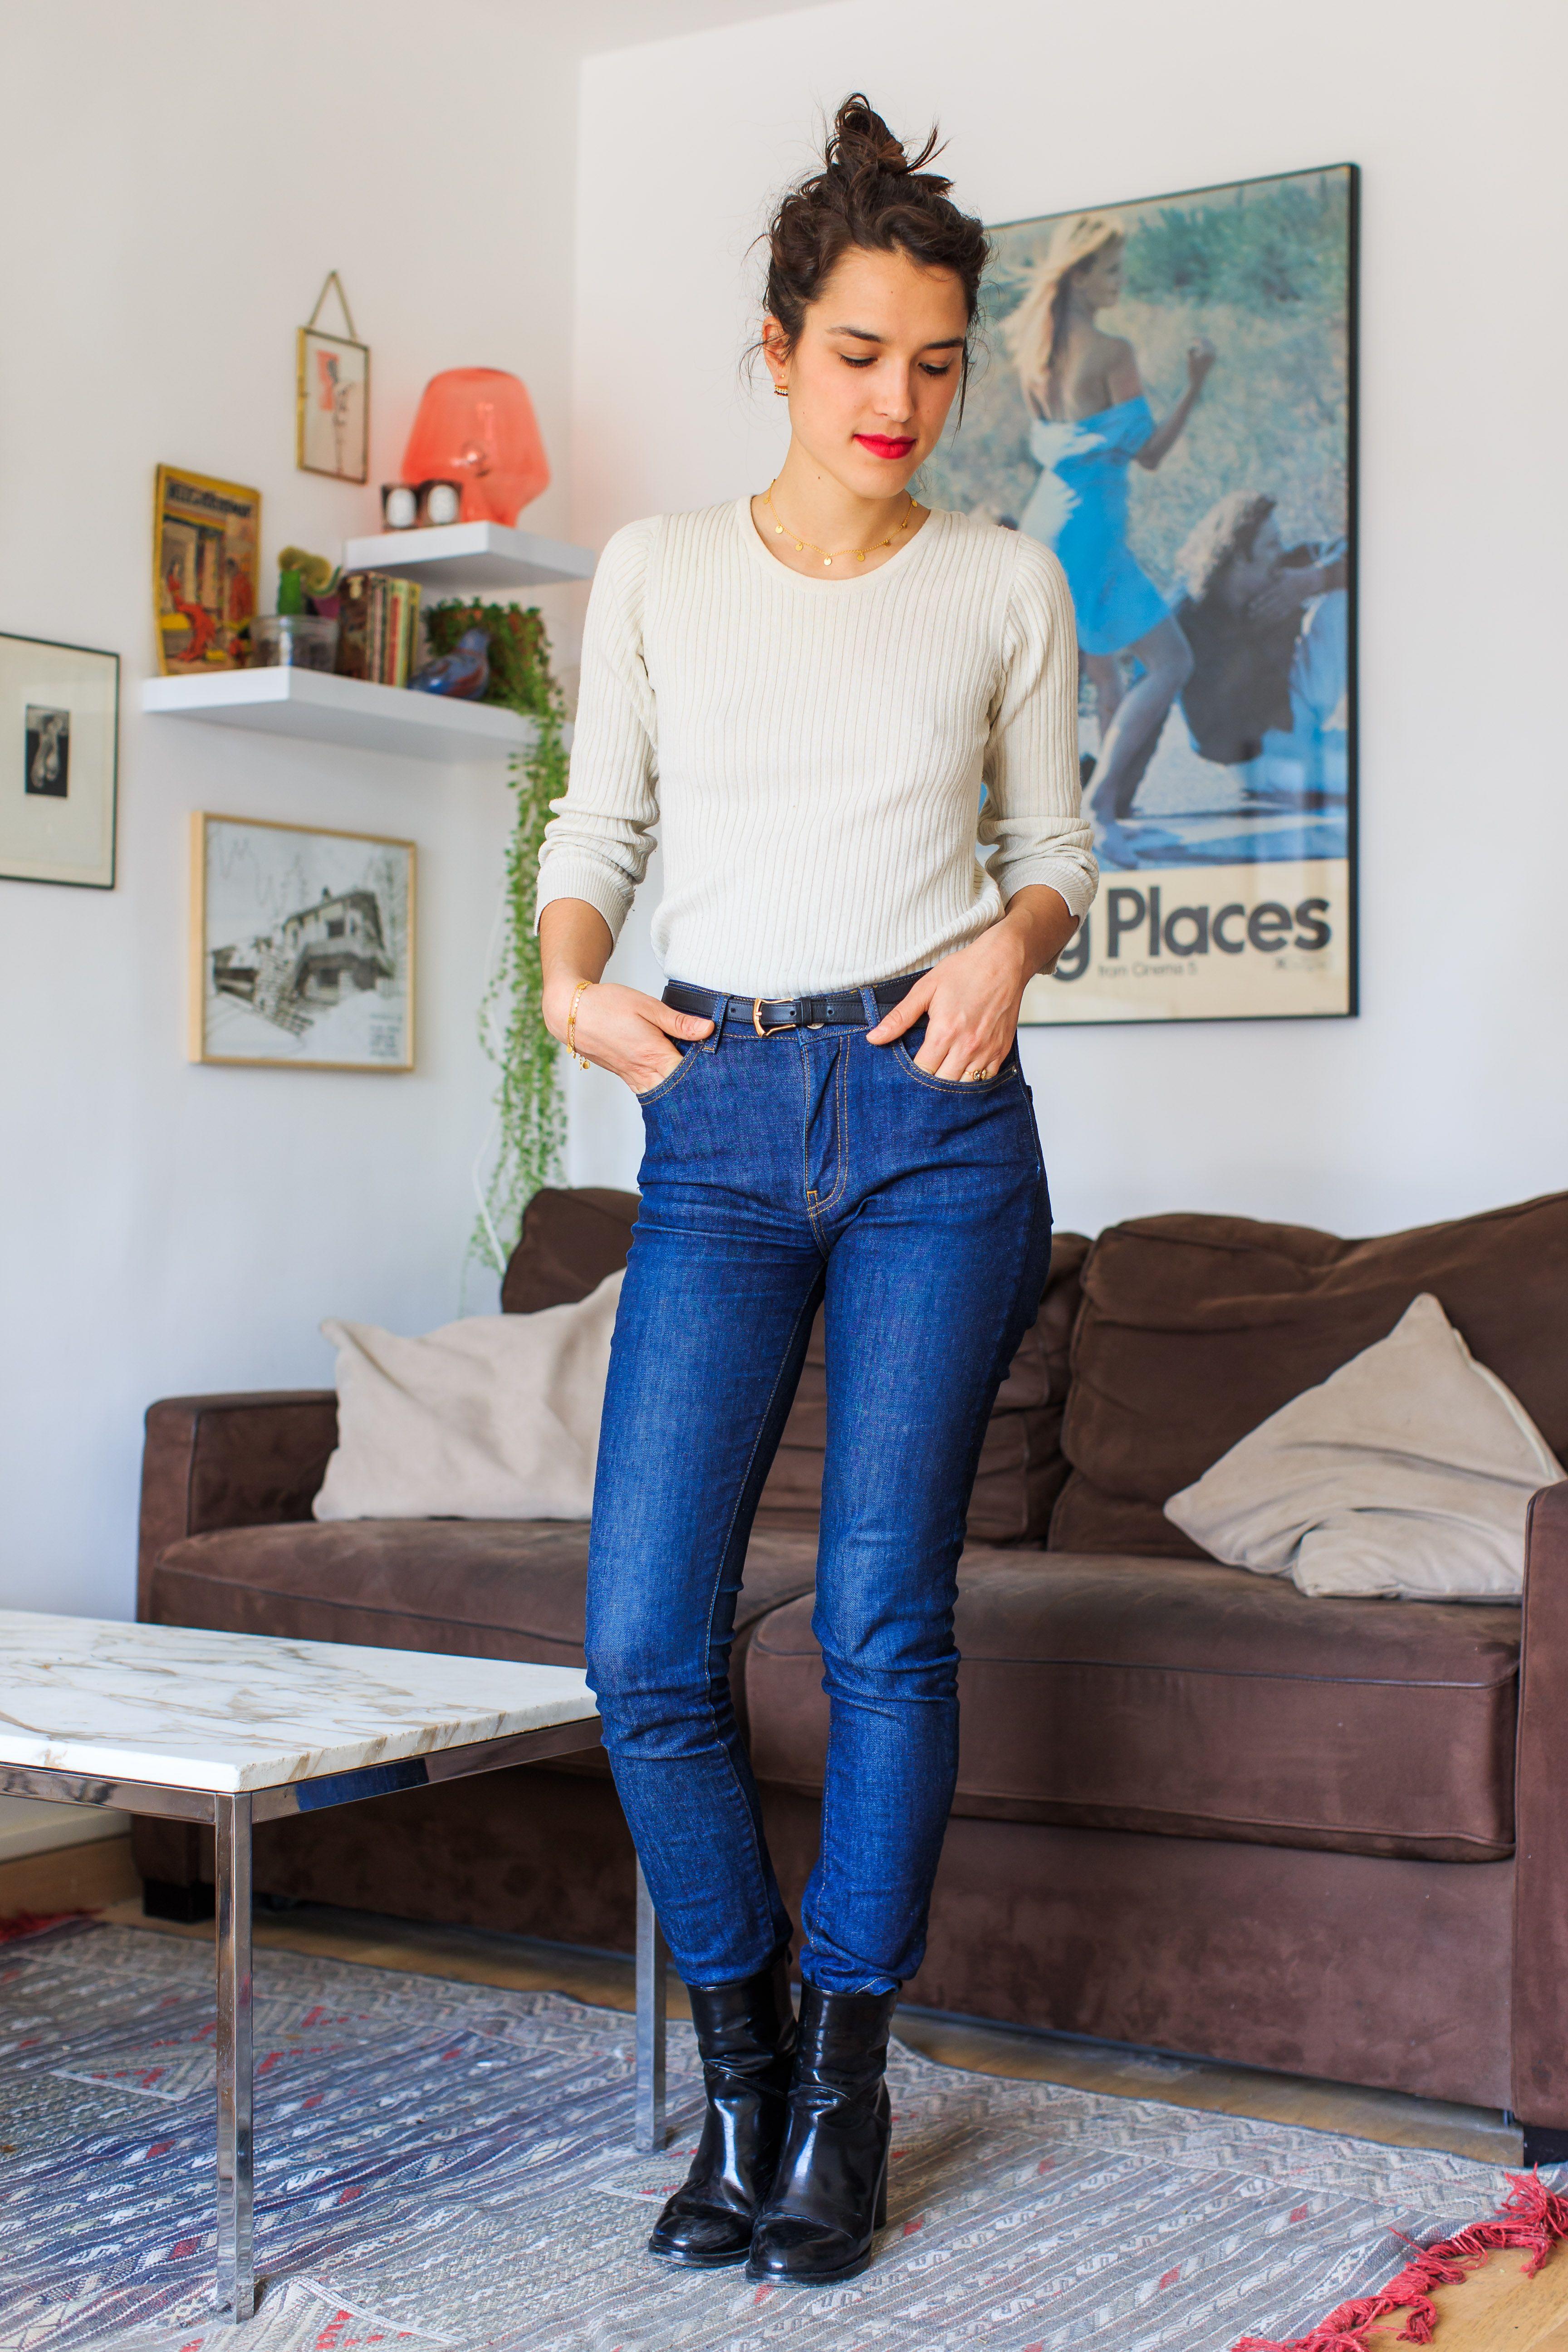 Tags french fashion la redoute secrets to french style style - D Couvrez La Semaine De Louise Damas En 4 Silhouettes Parisienne Stylejeanne Damaskfrench